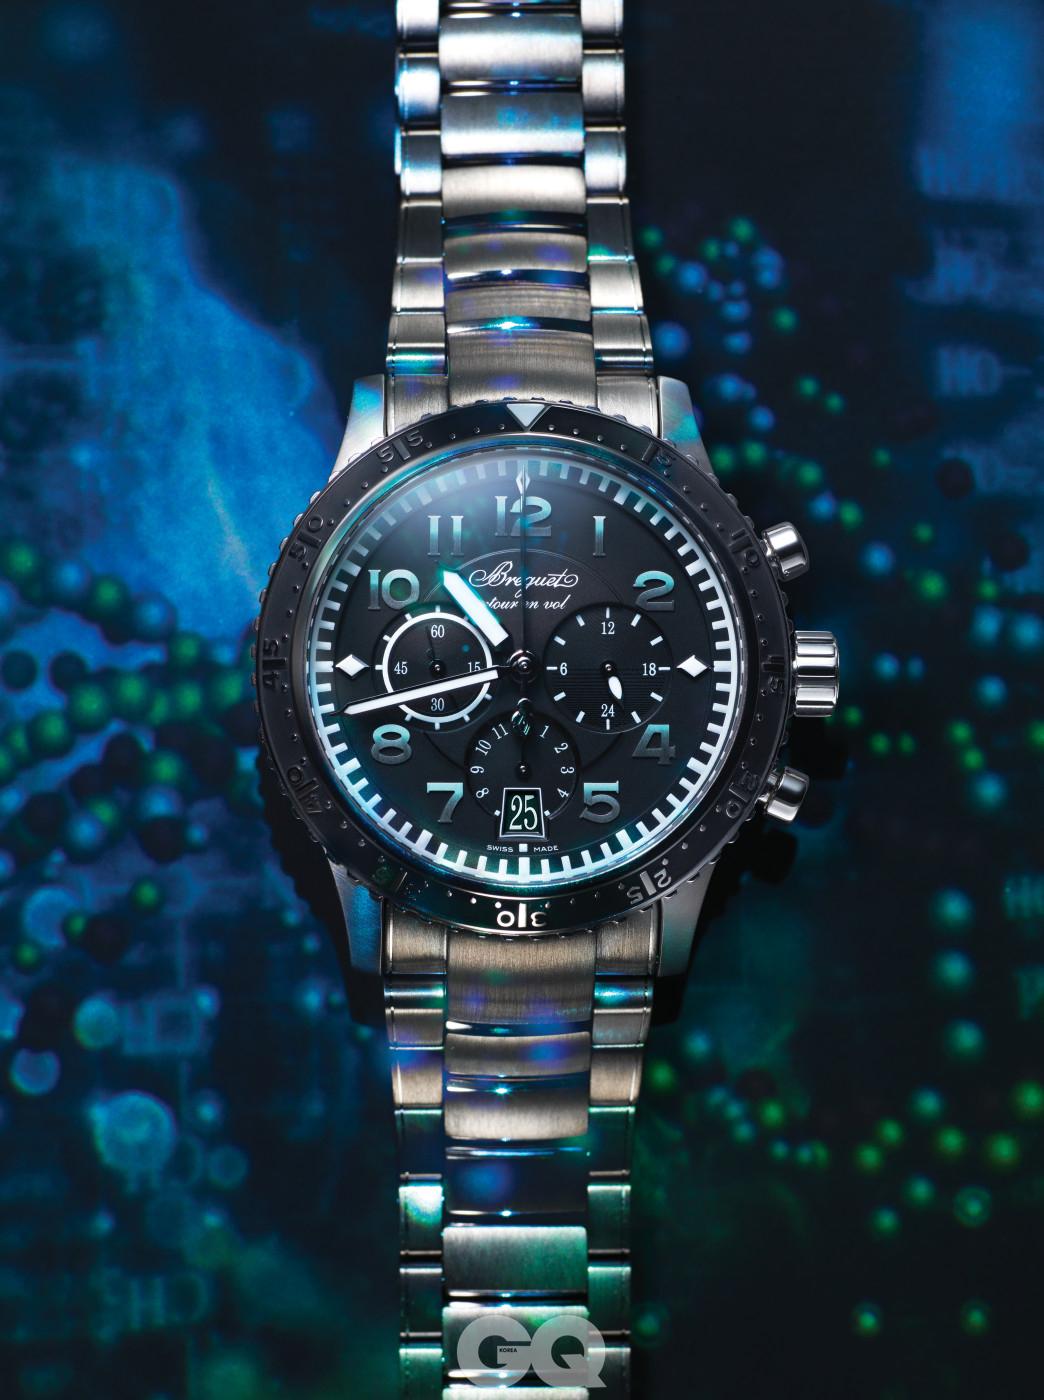 180712 GQ(watch)_6885-1